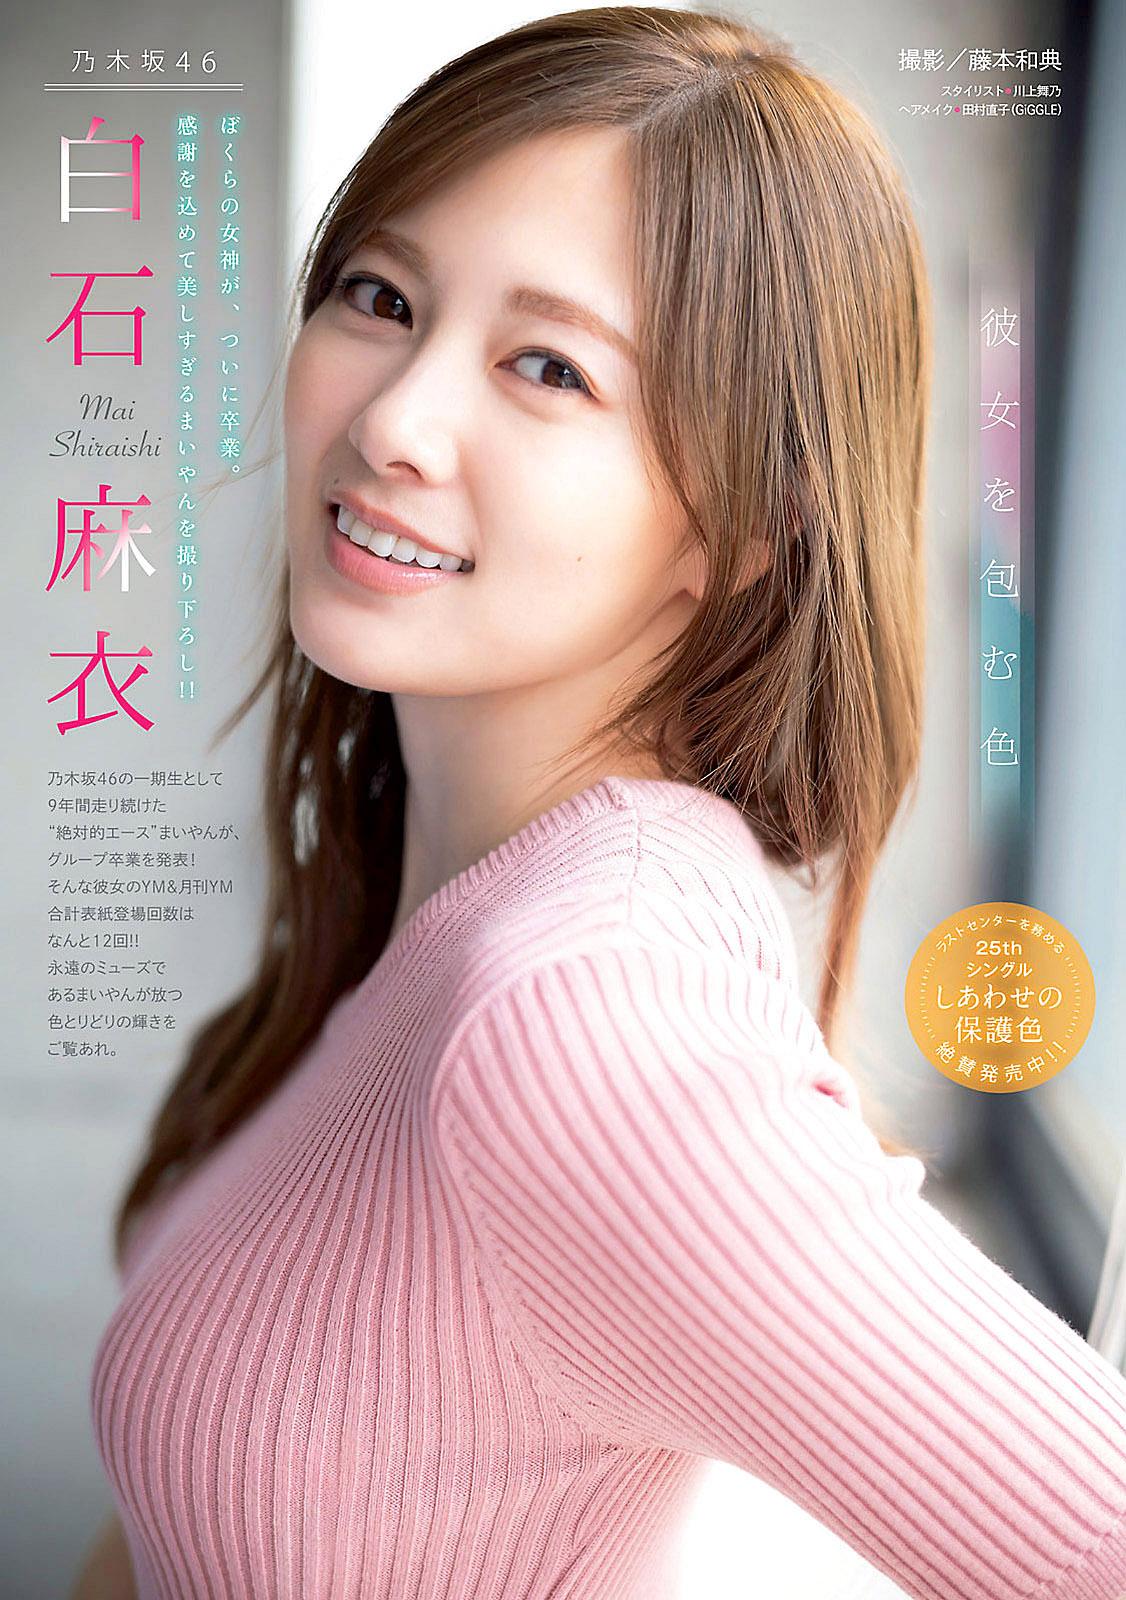 MShiraishi Young Magazine 200504 02.jpg